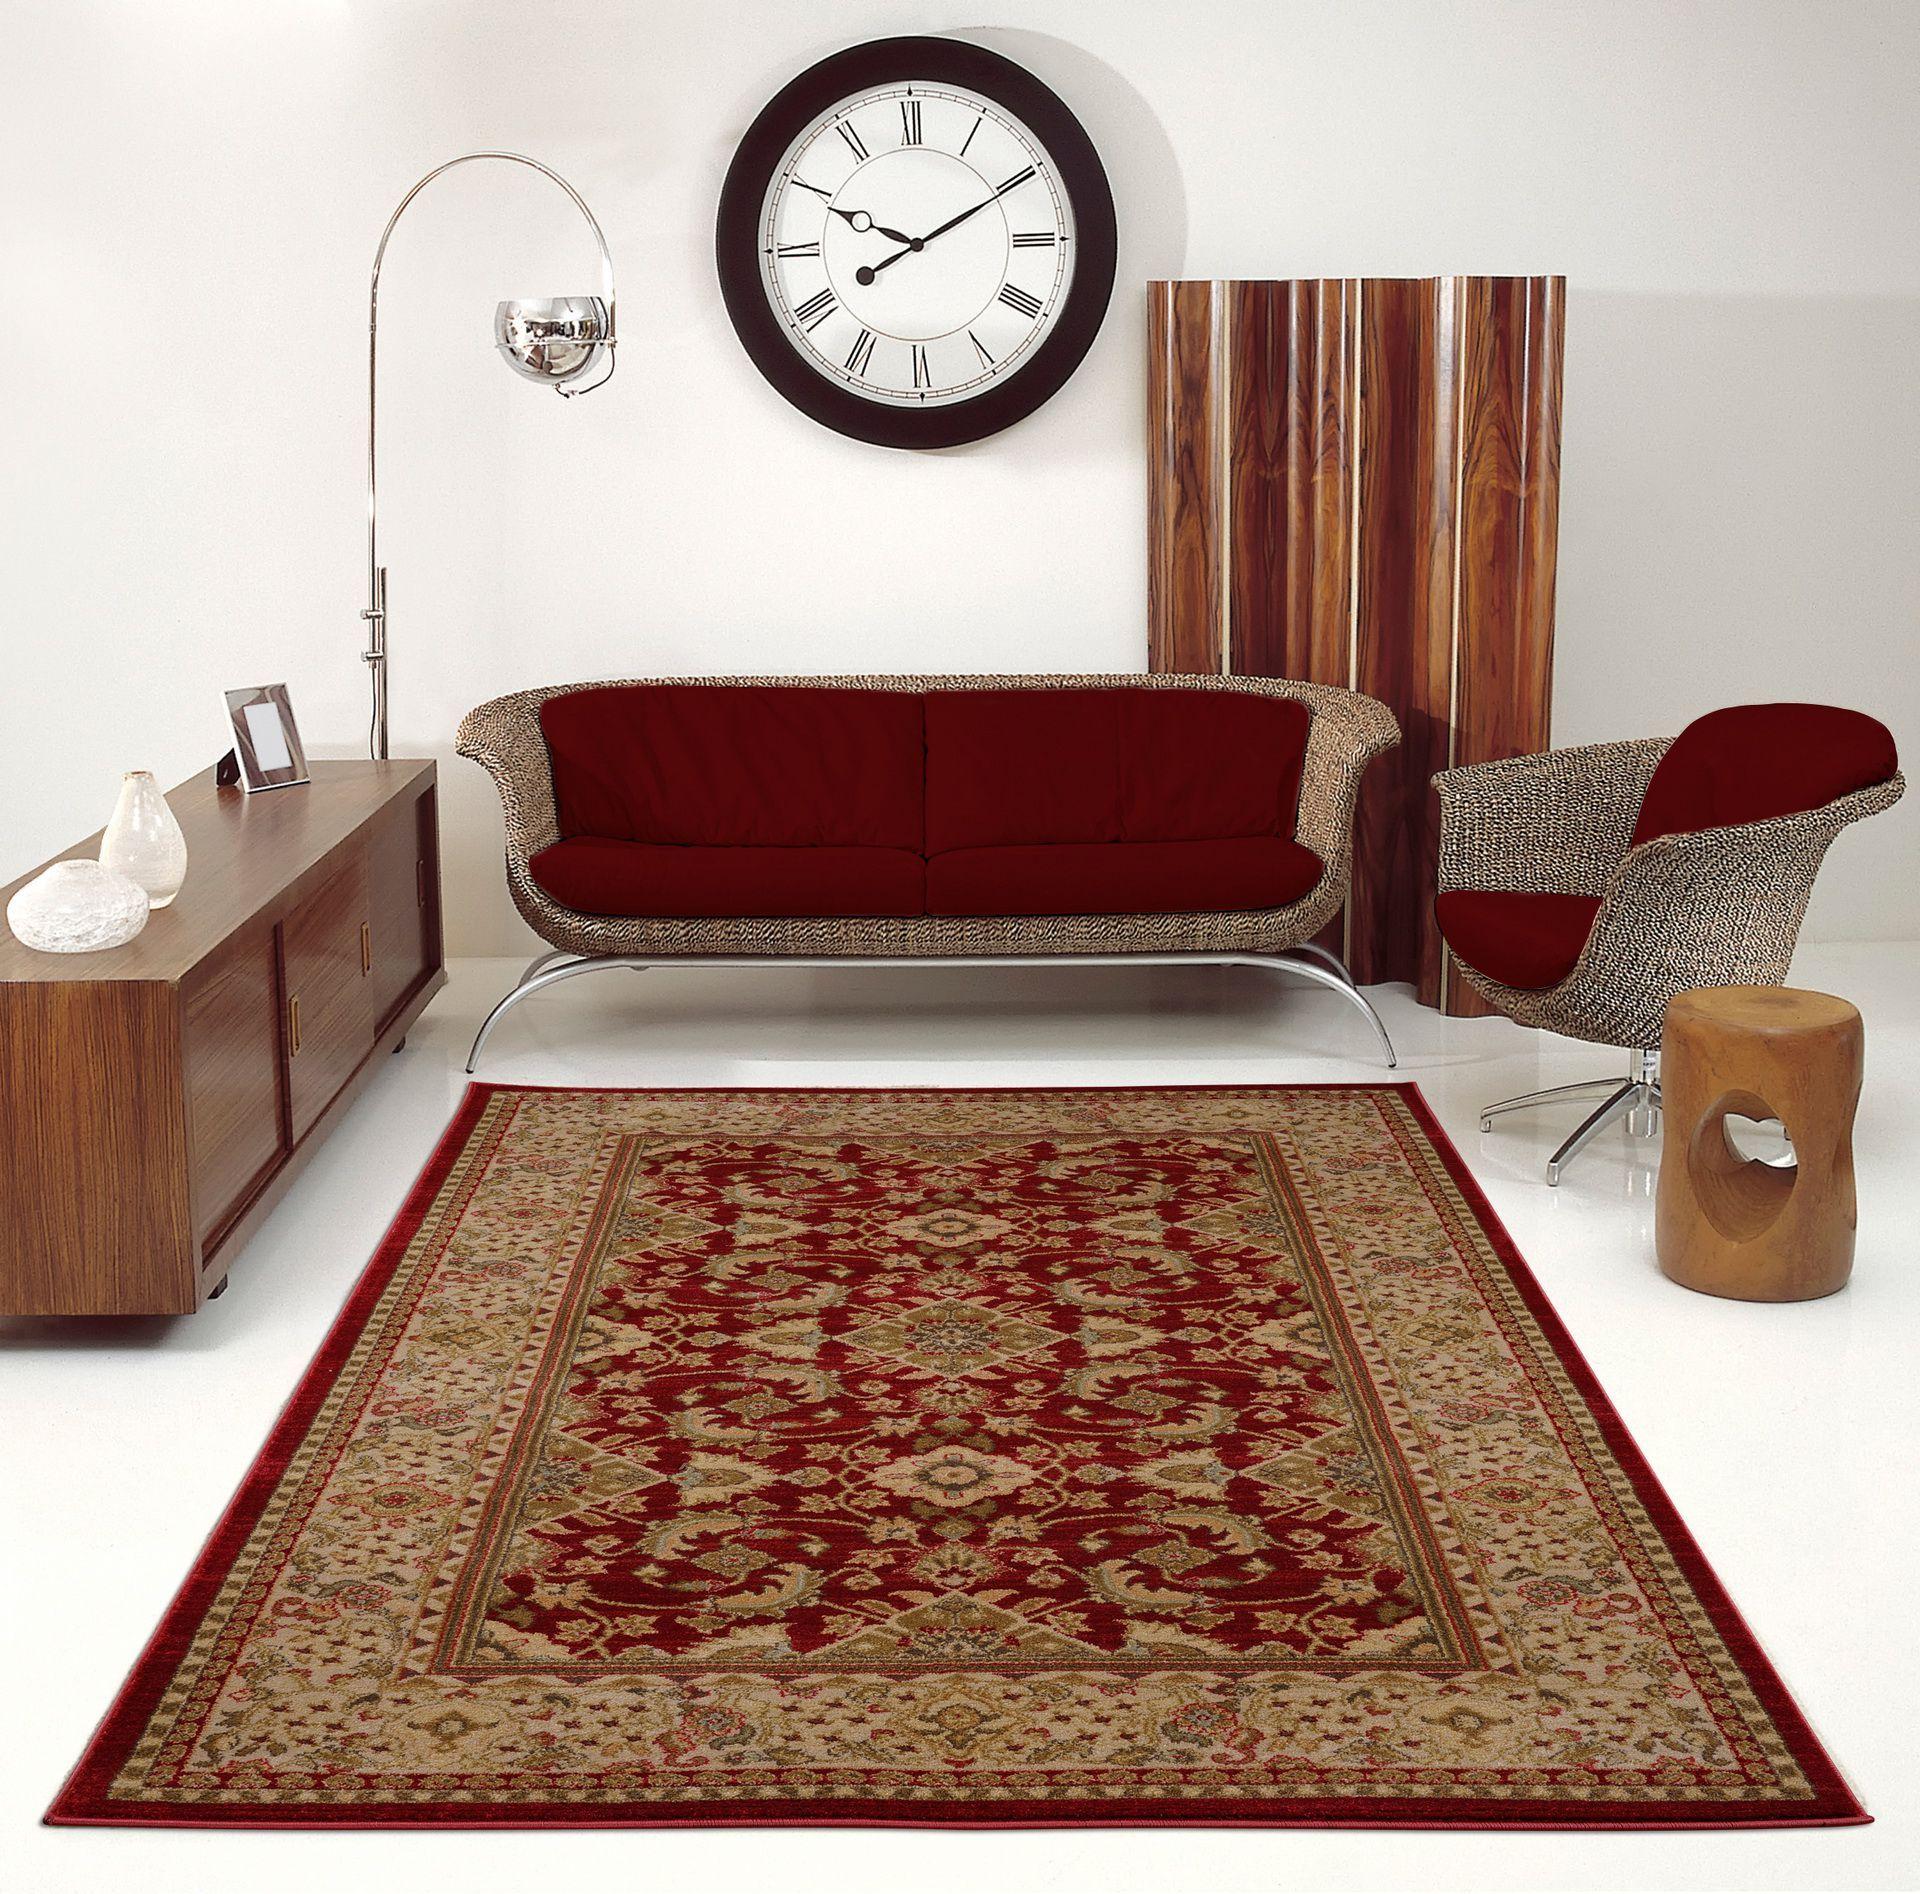 "Ladole Rugs Traditional Persian Design Runner Area Rug Carpet Cream Red(2'7"" x 9'10"", 80cm x 300cm) - image 4 of 4"